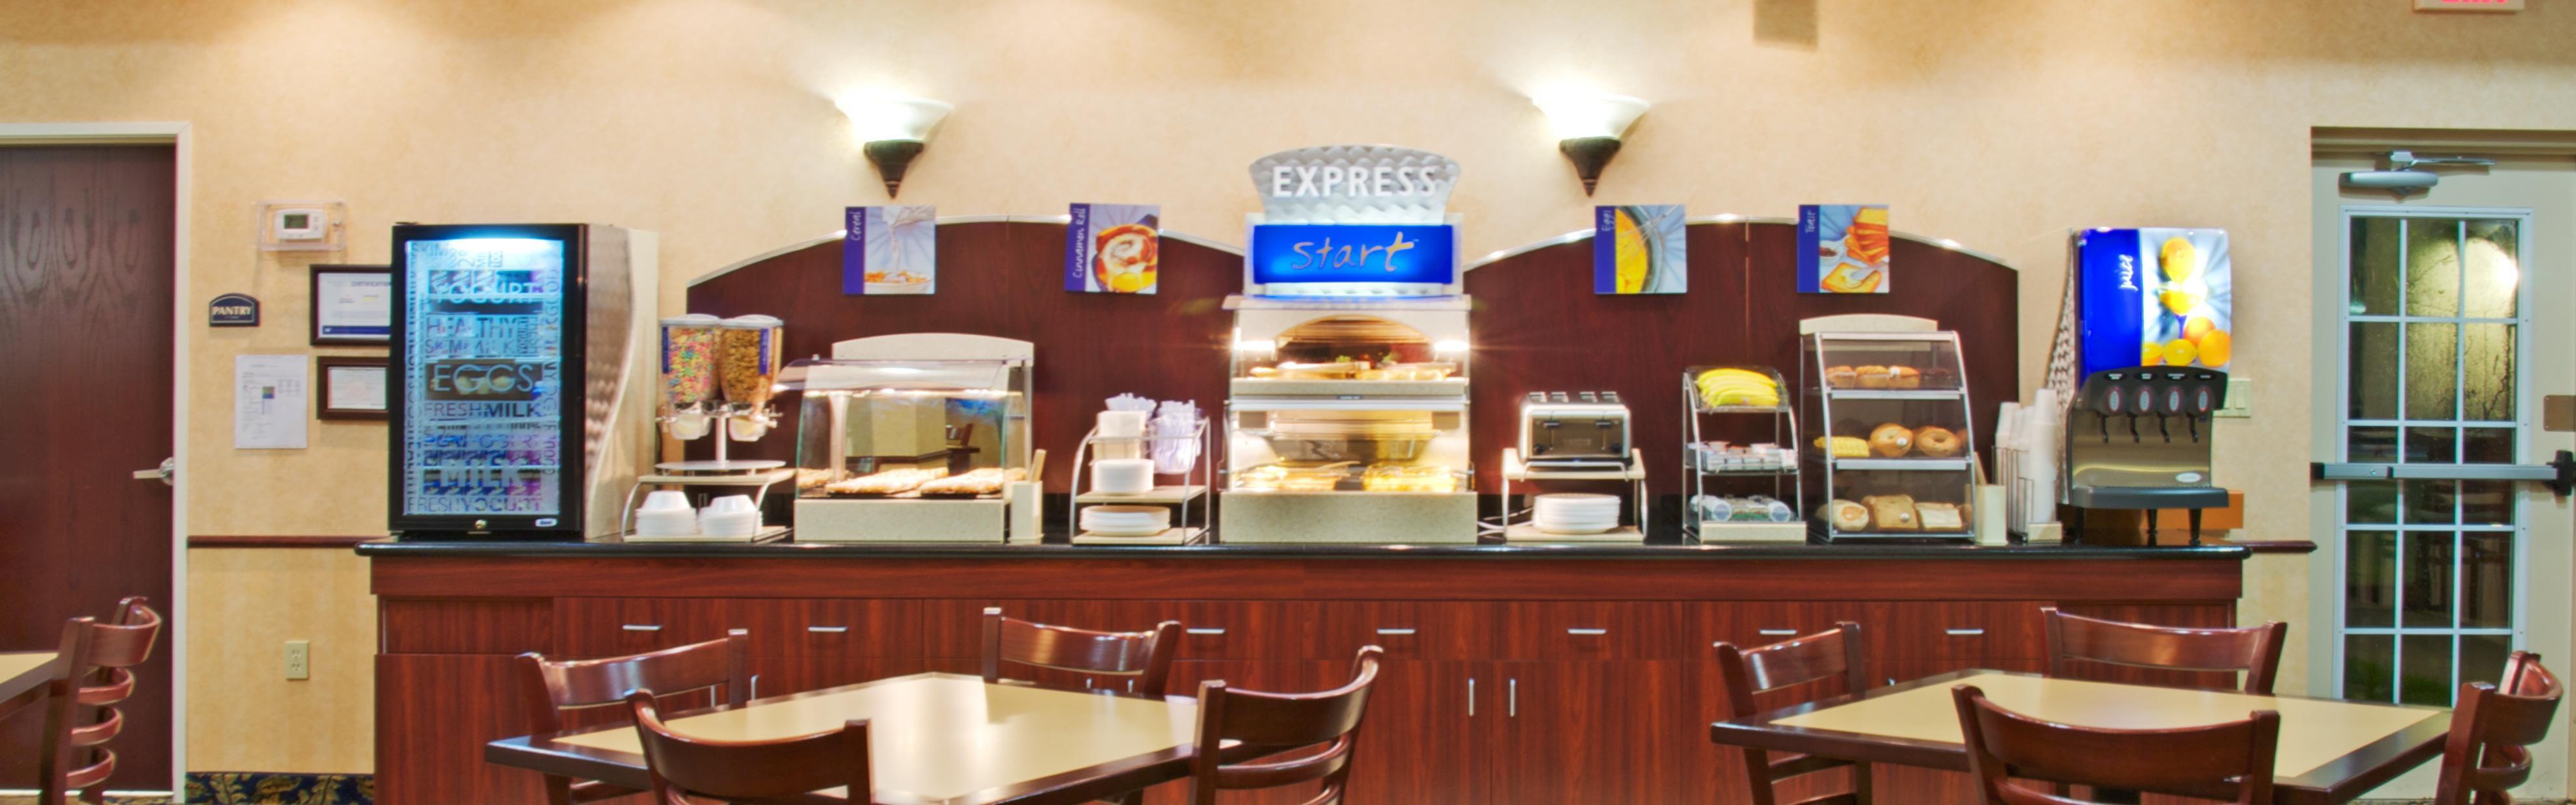 Holiday Inn Express Orange image 3